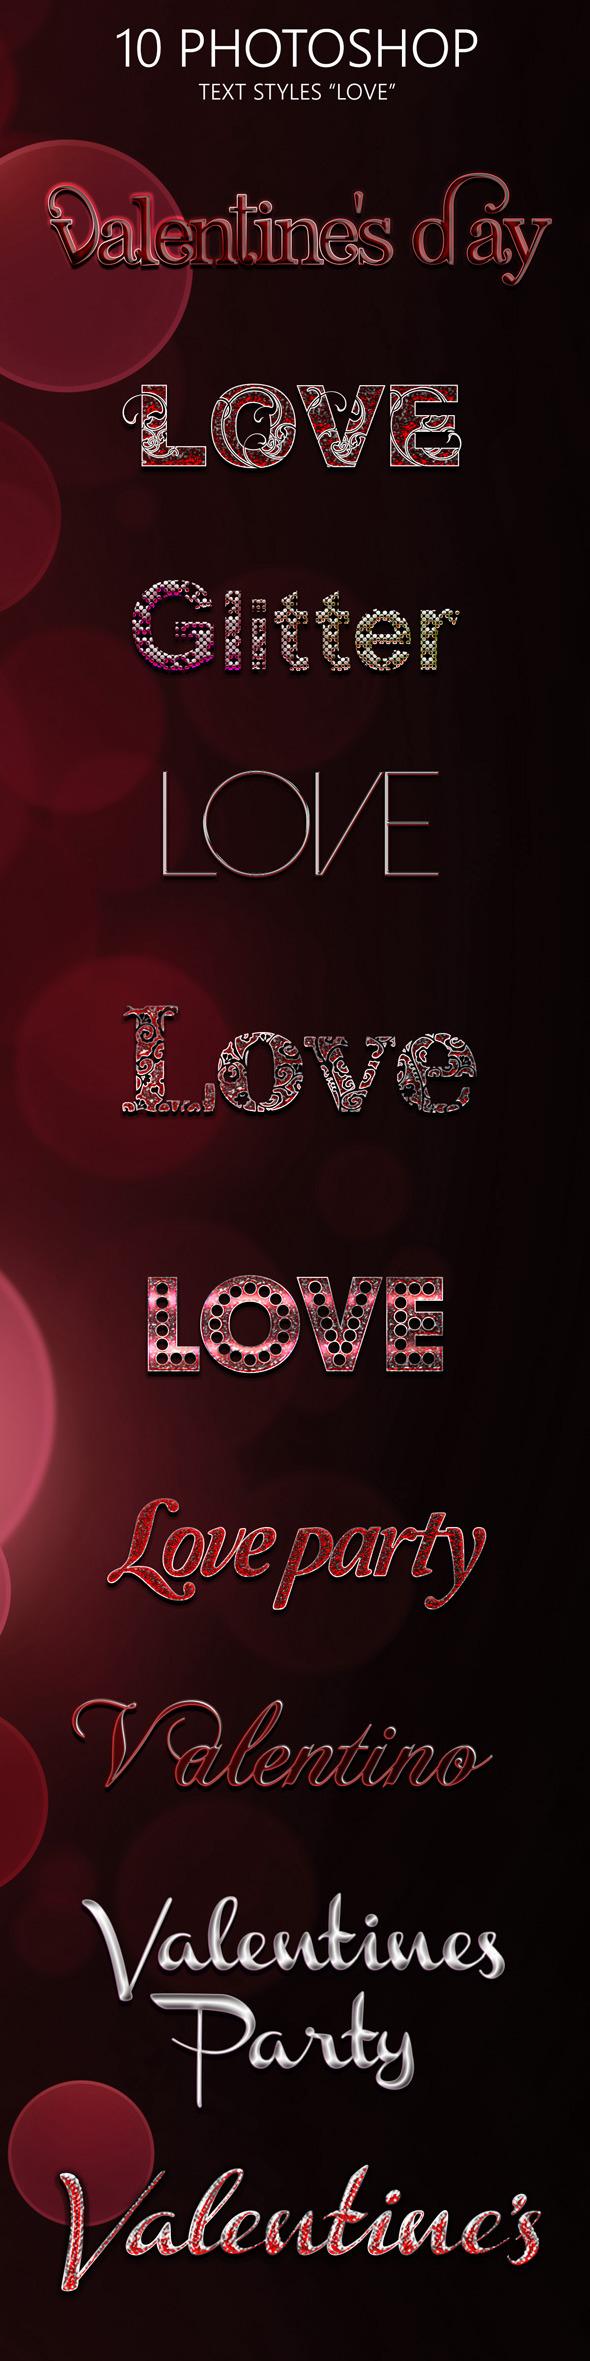 10 Love Photoshop Style - Styles Photoshop